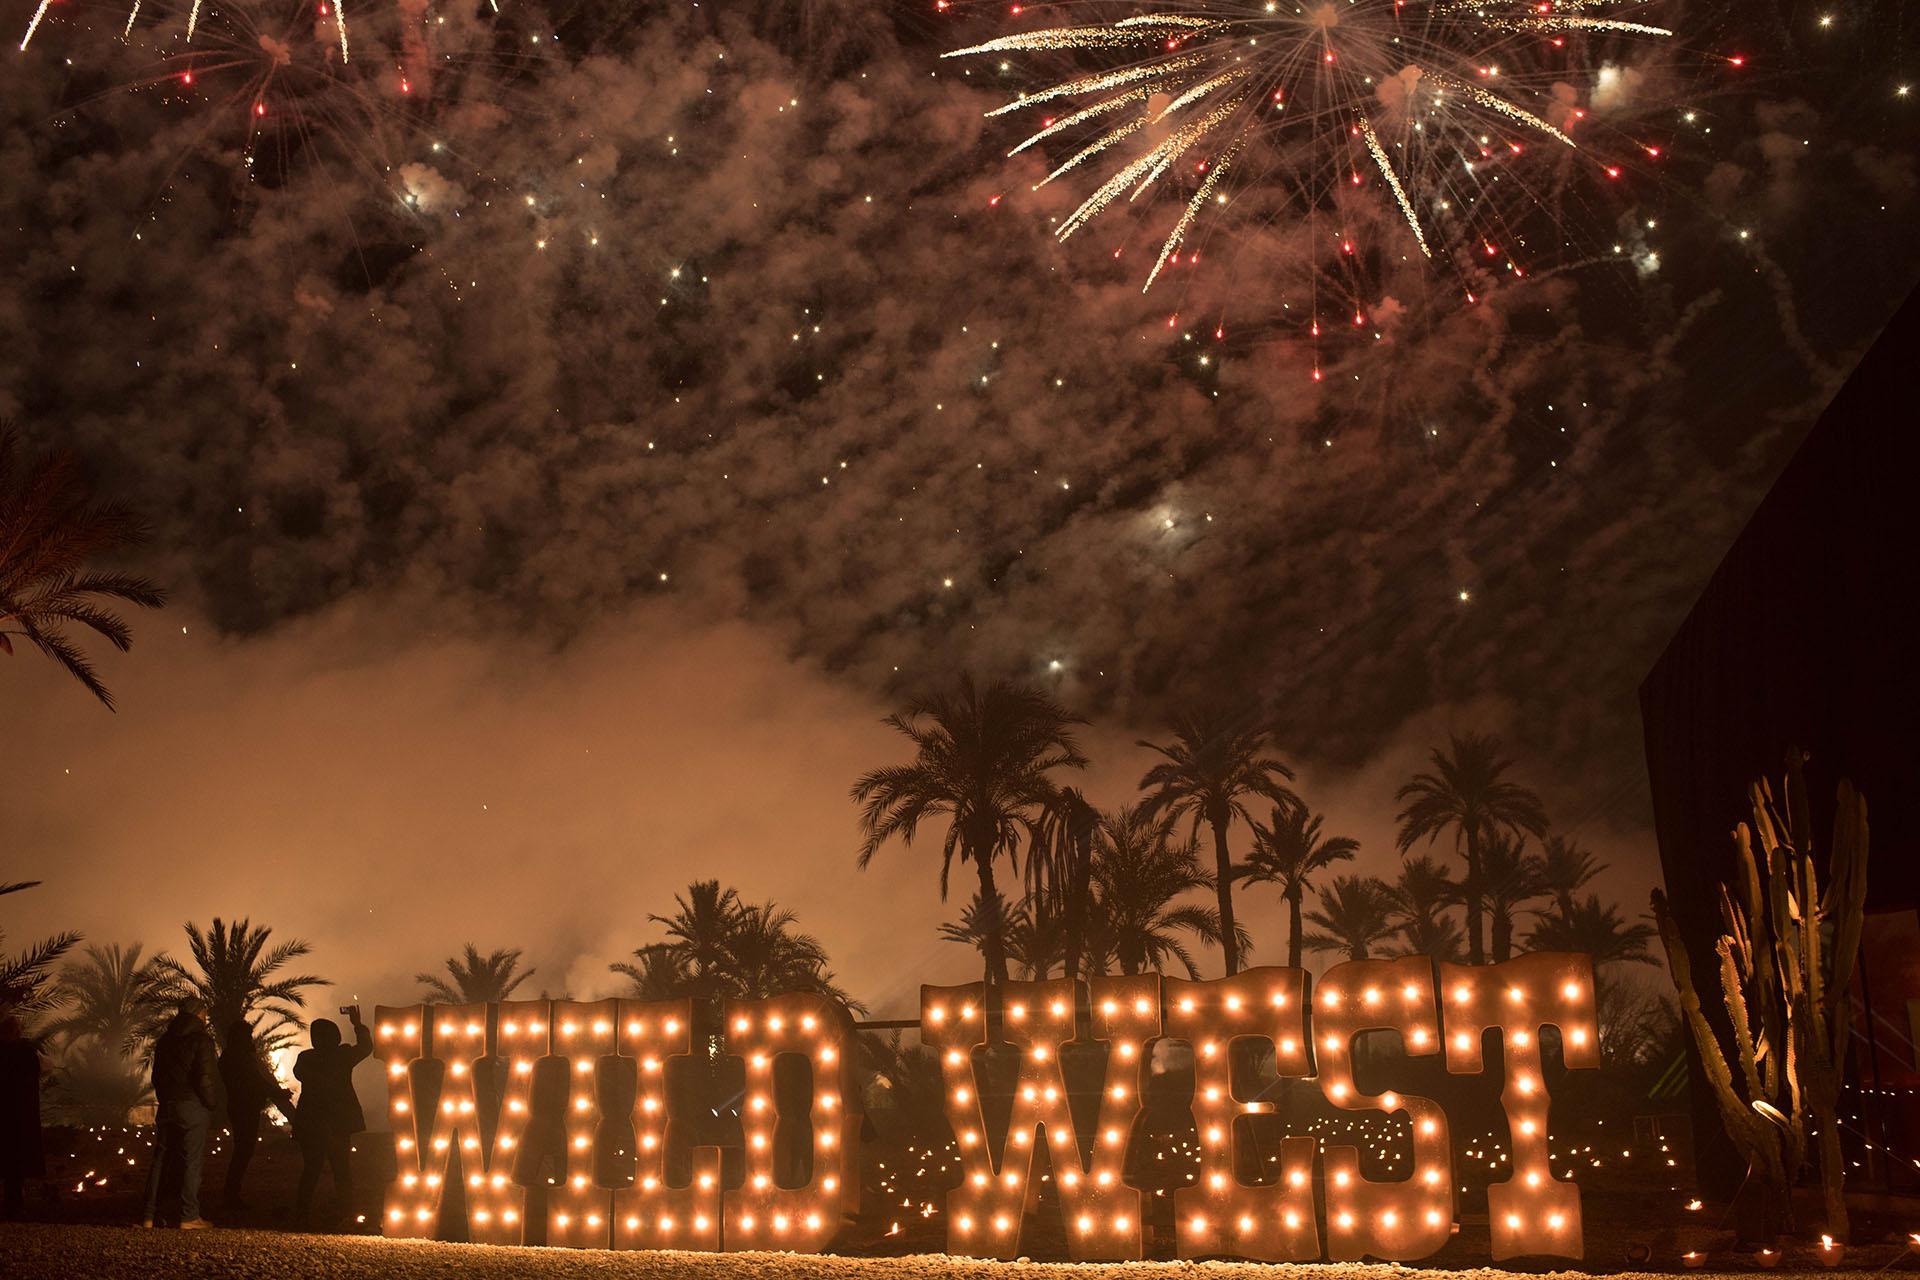 Un espectacular show de fuegos artificiales iluminó la noche soñada de Alejandro Roemmers